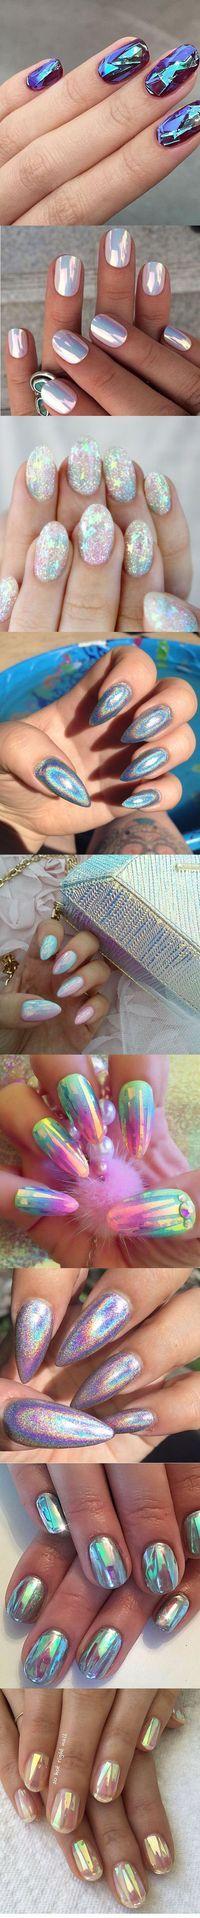 Holographic mermaid nails #manicure | ko-te.com by @evatornado | http://miascollection.com